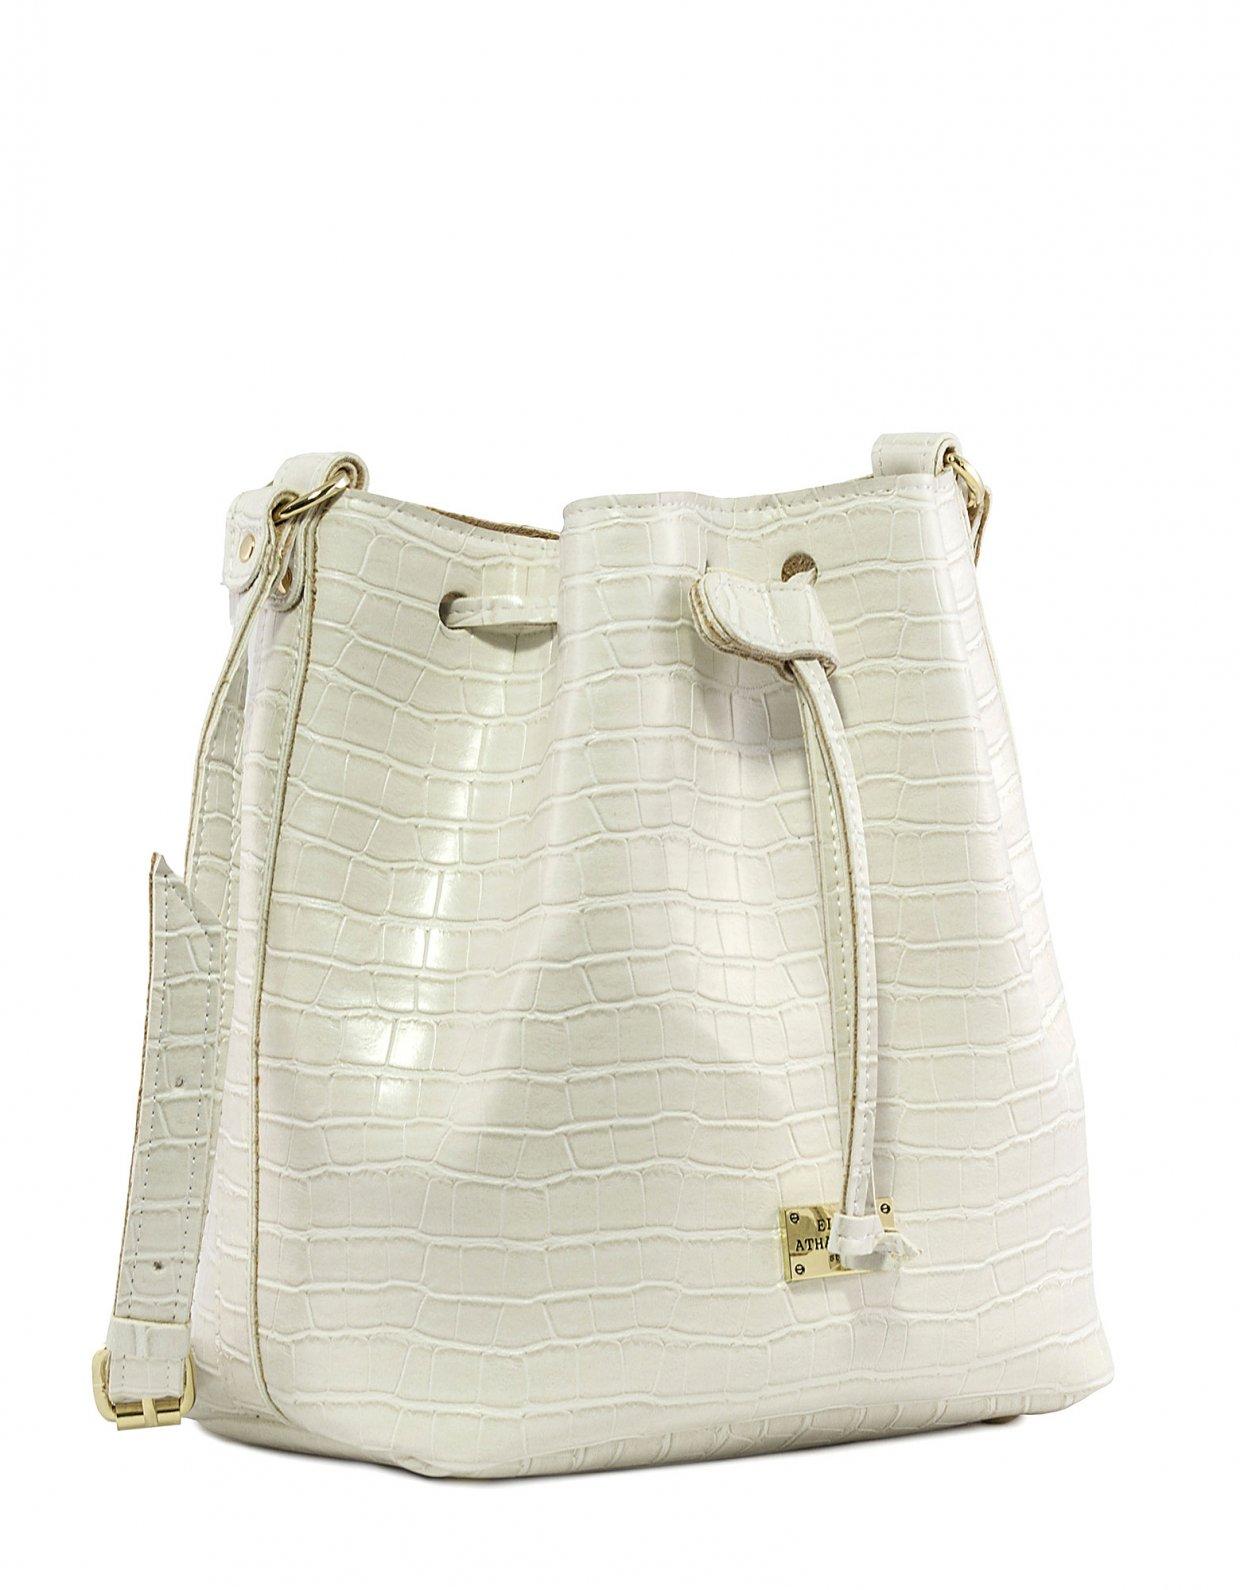 Elena Athanasiou Croco pouch bag white